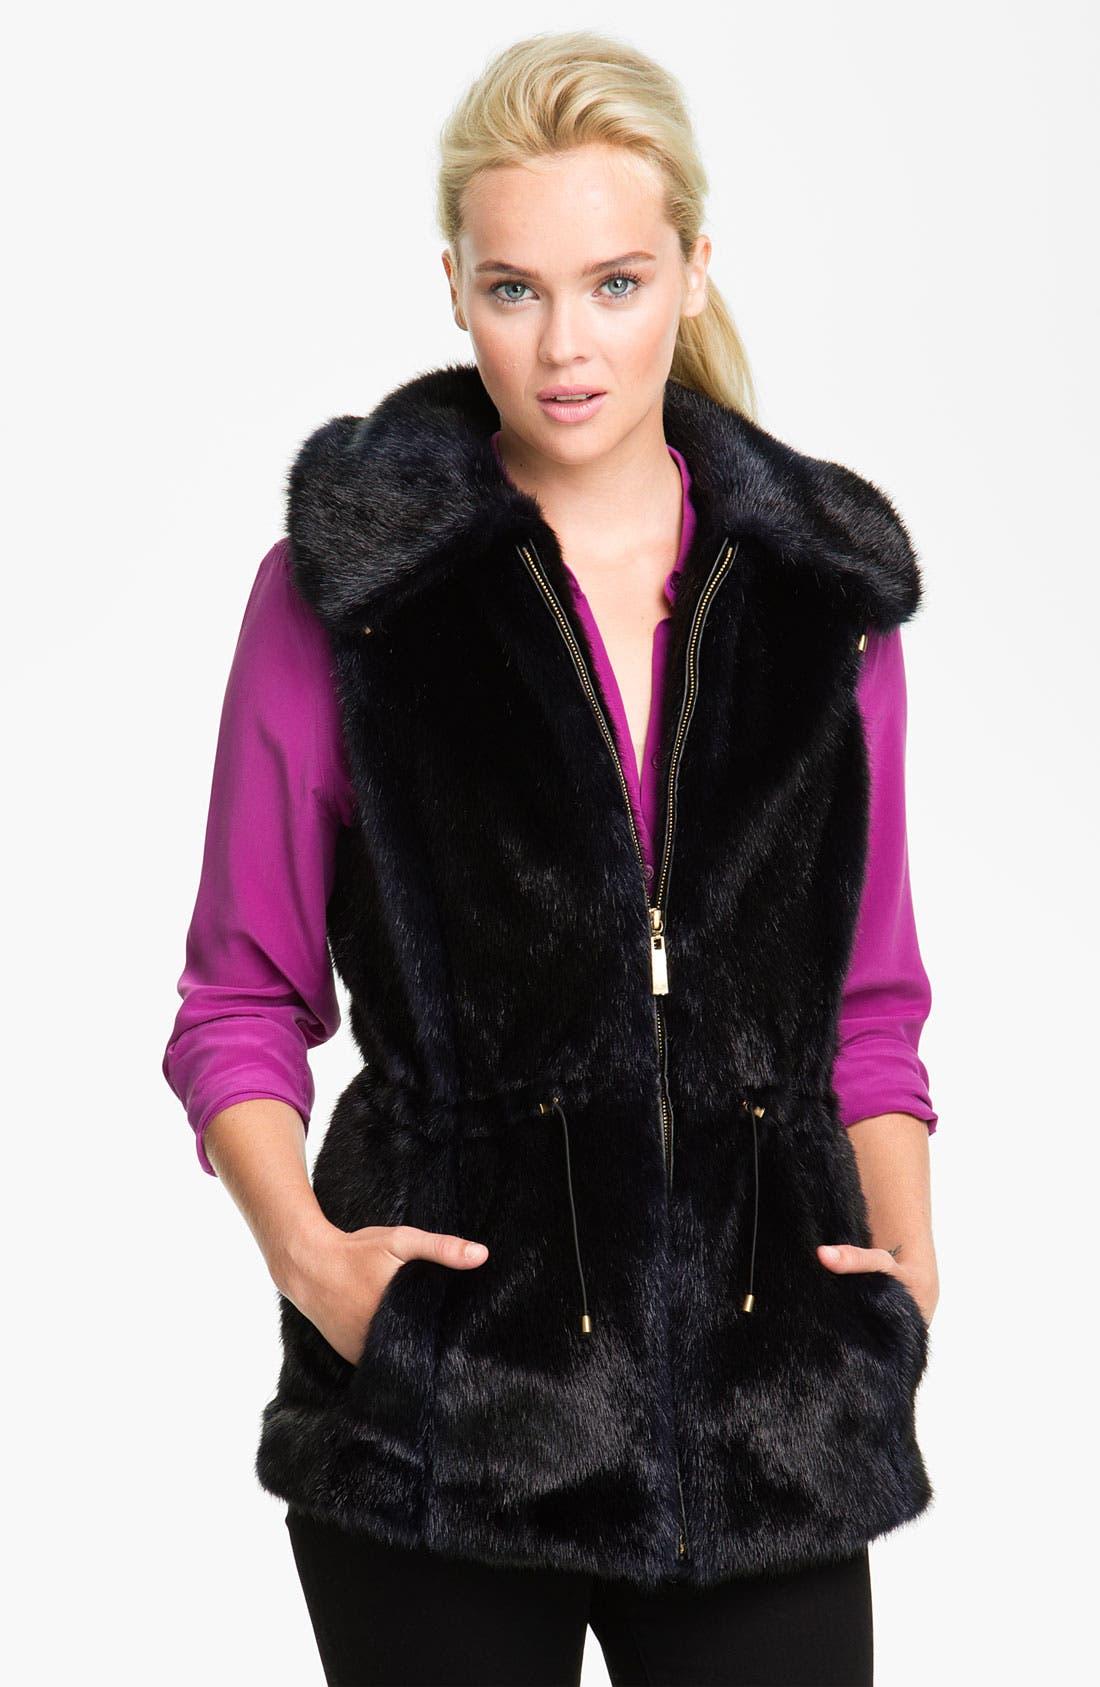 Alternate Image 1 Selected - Ellen Tracy Faux Fur Anorak Vest (Nordstrom Exclusive)